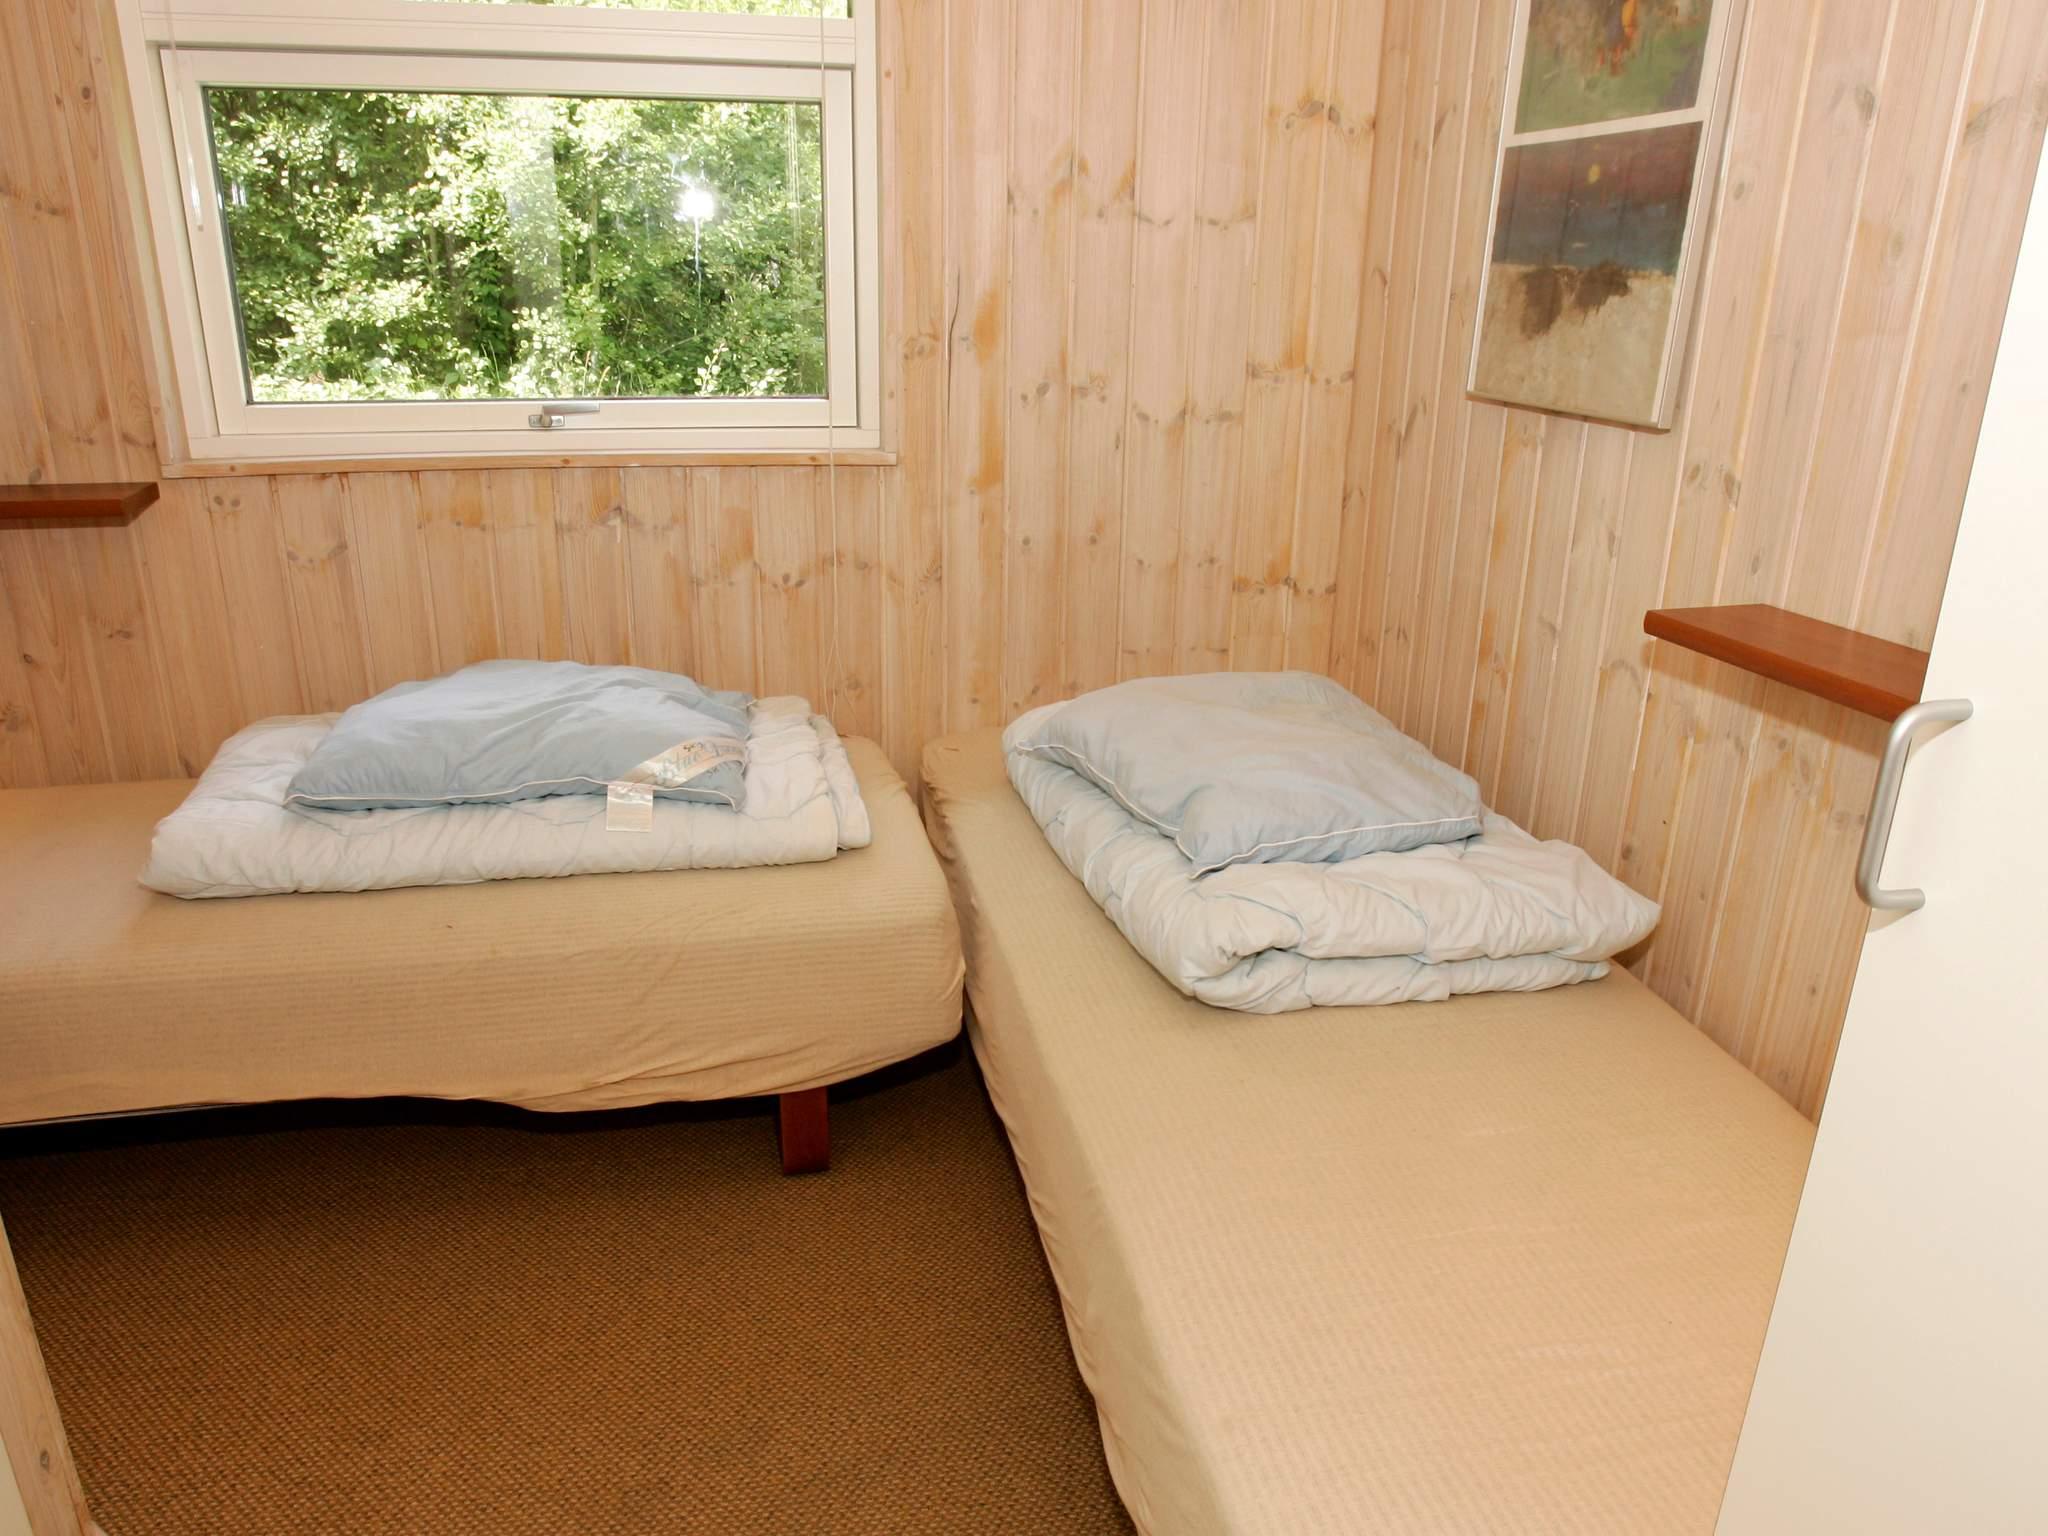 Ferienhaus Hasle (83419), Hasle, , Bornholm, Dänemark, Bild 10